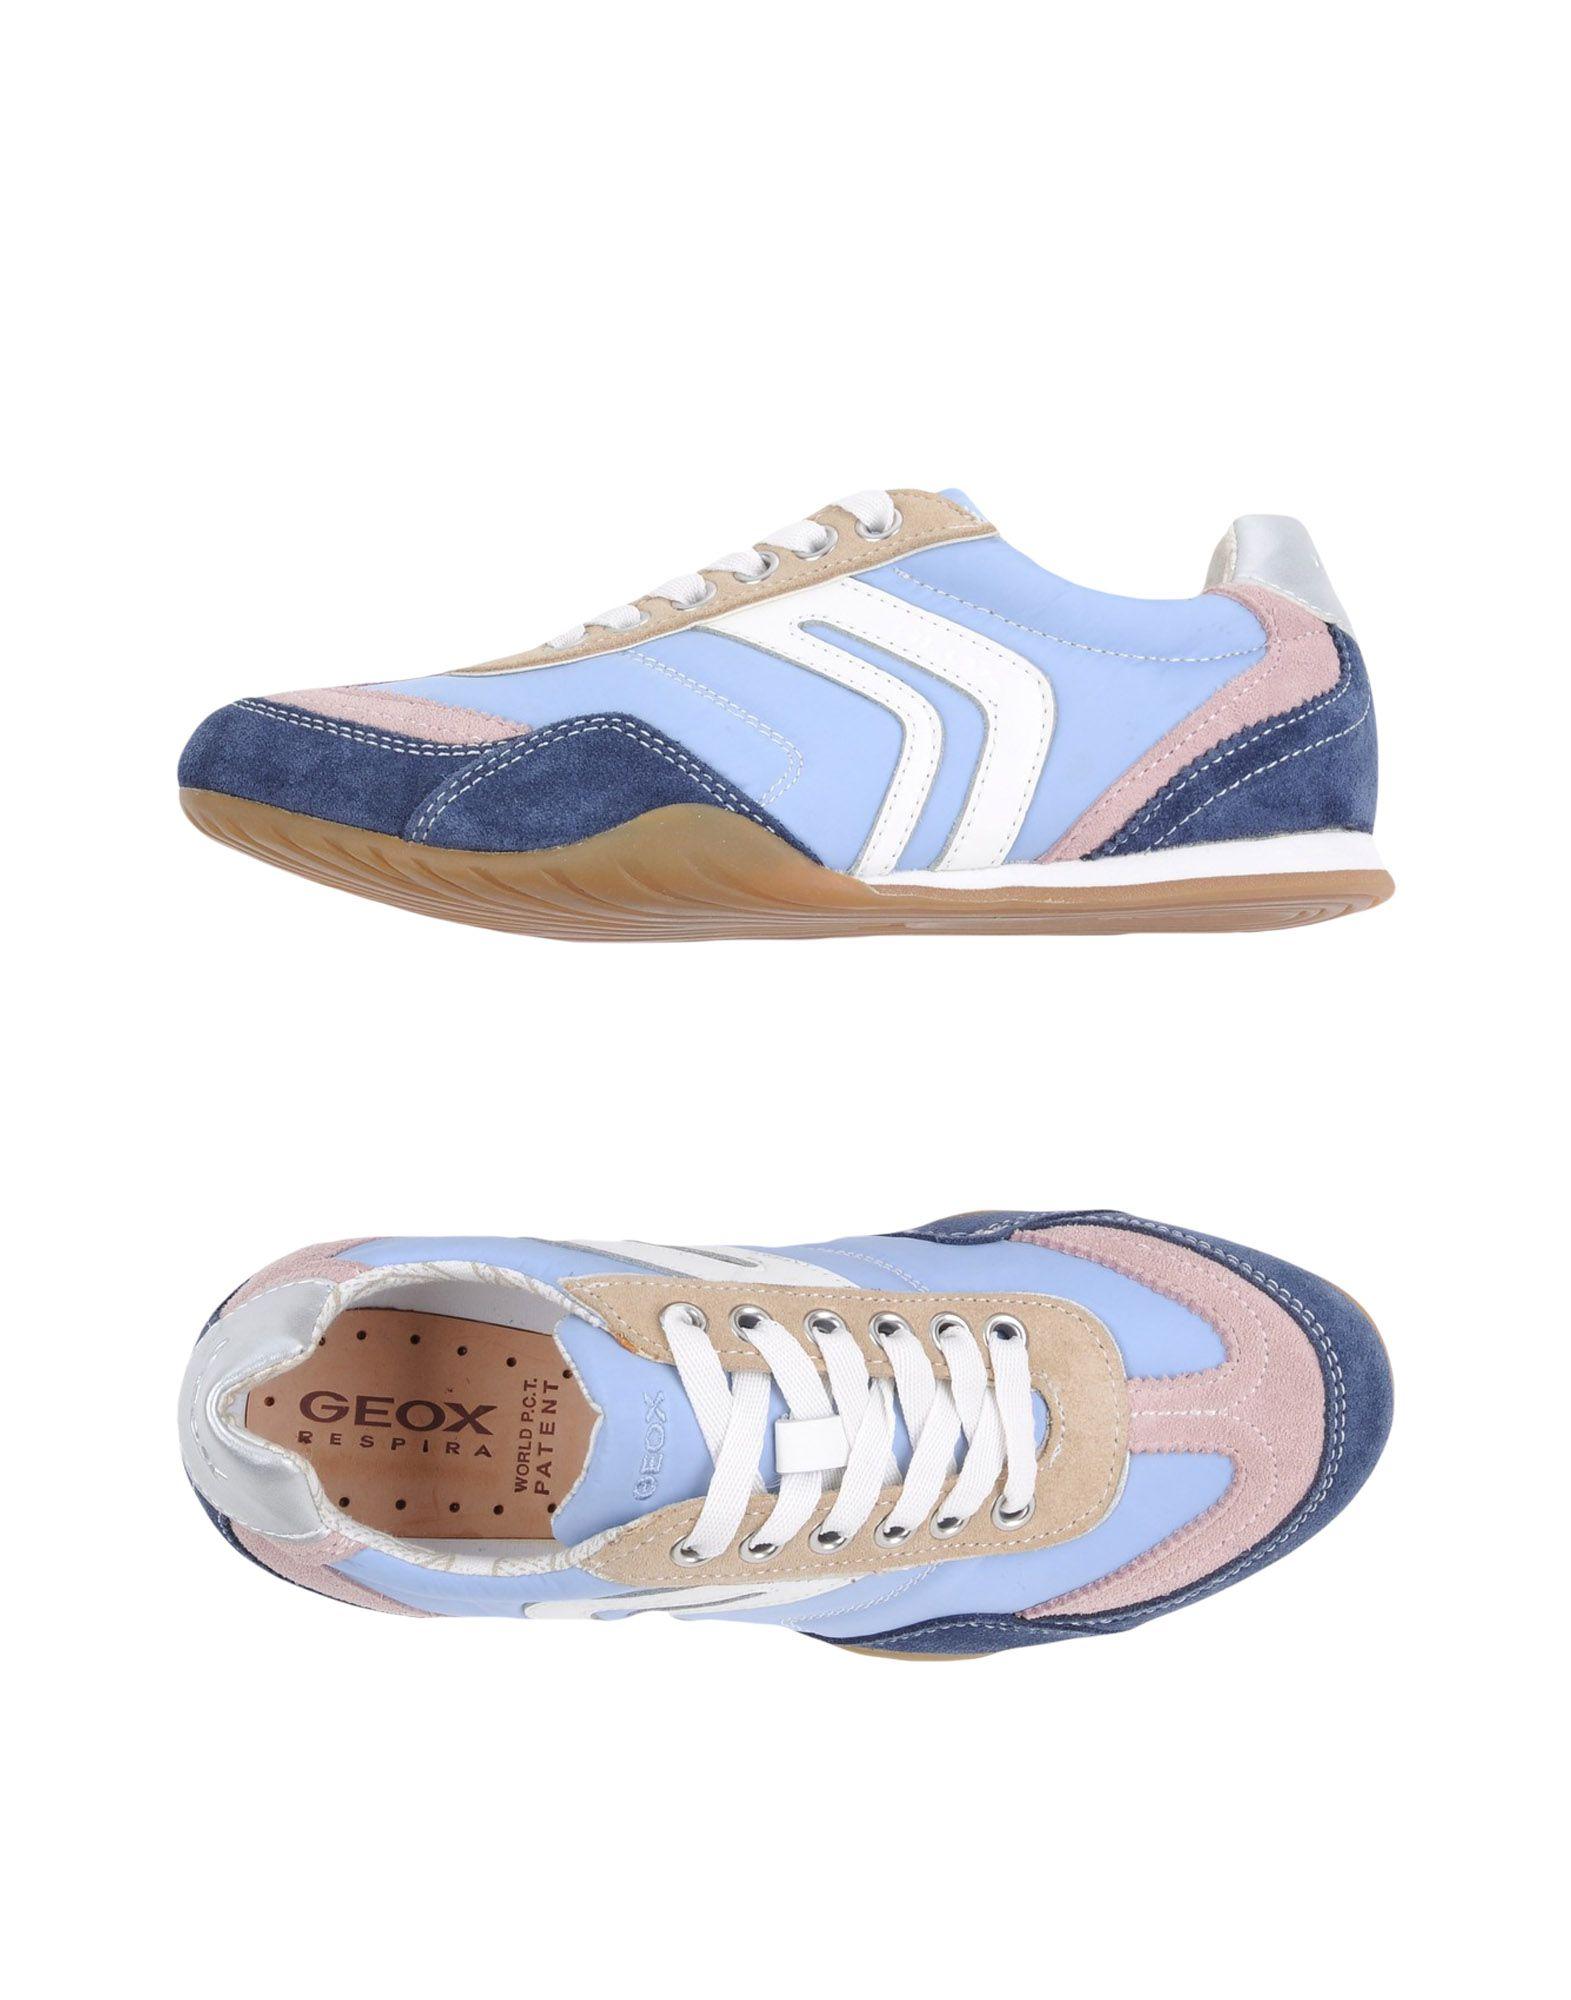 Geox Gute Sneakers Damen  11328649GX Gute Geox Qualität beliebte Schuhe 210f59